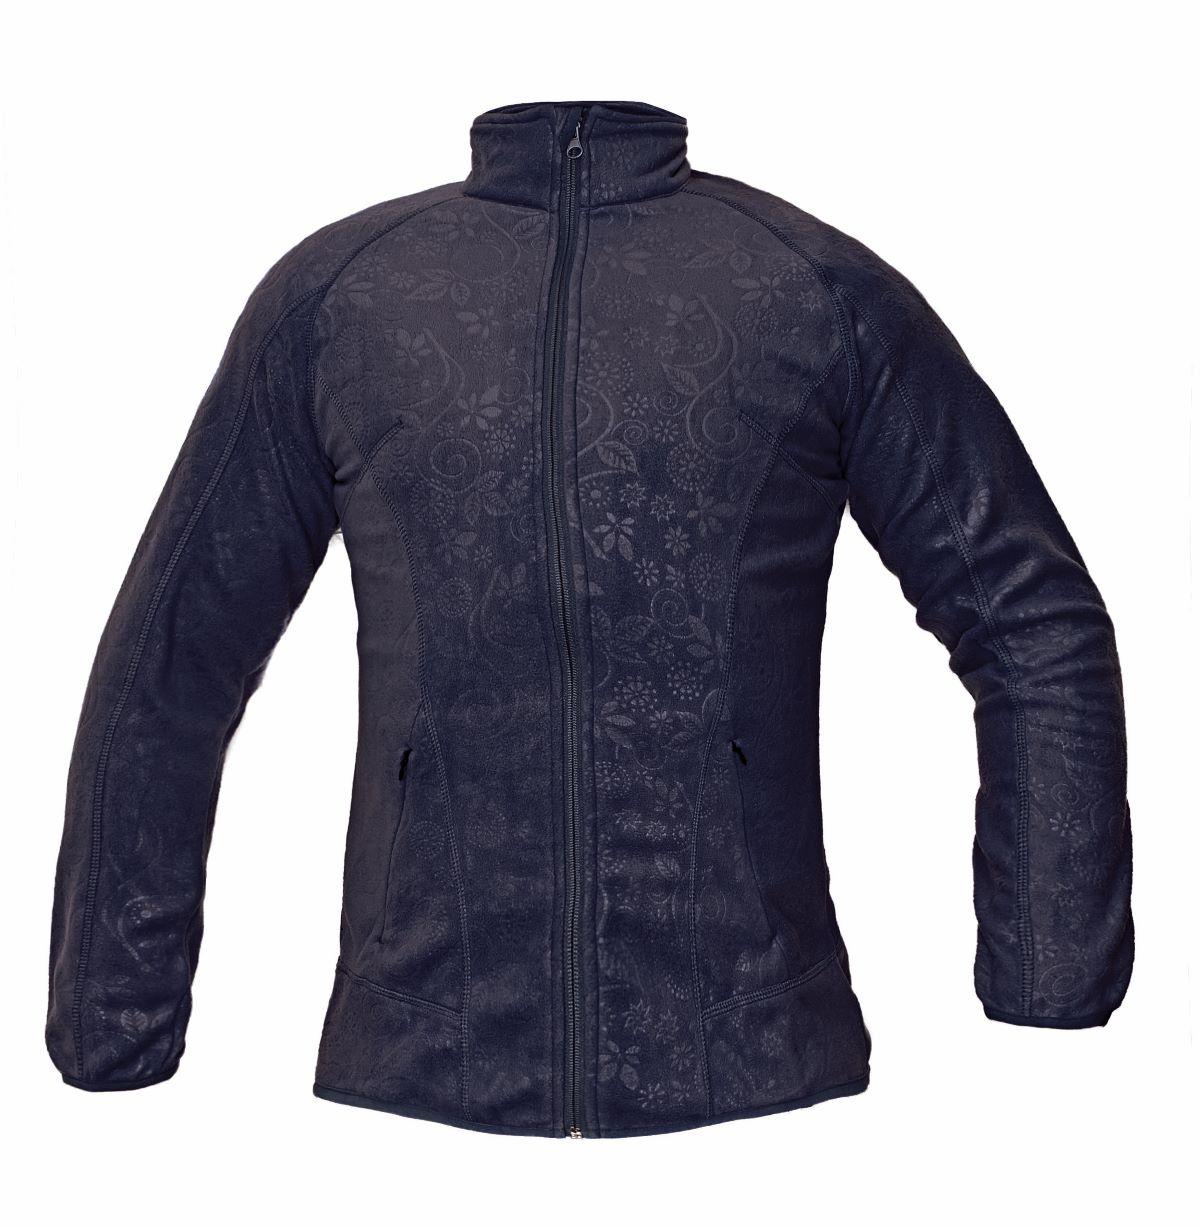 YOWIE fleece mikina navy/tm. modrá 03010323 41 L